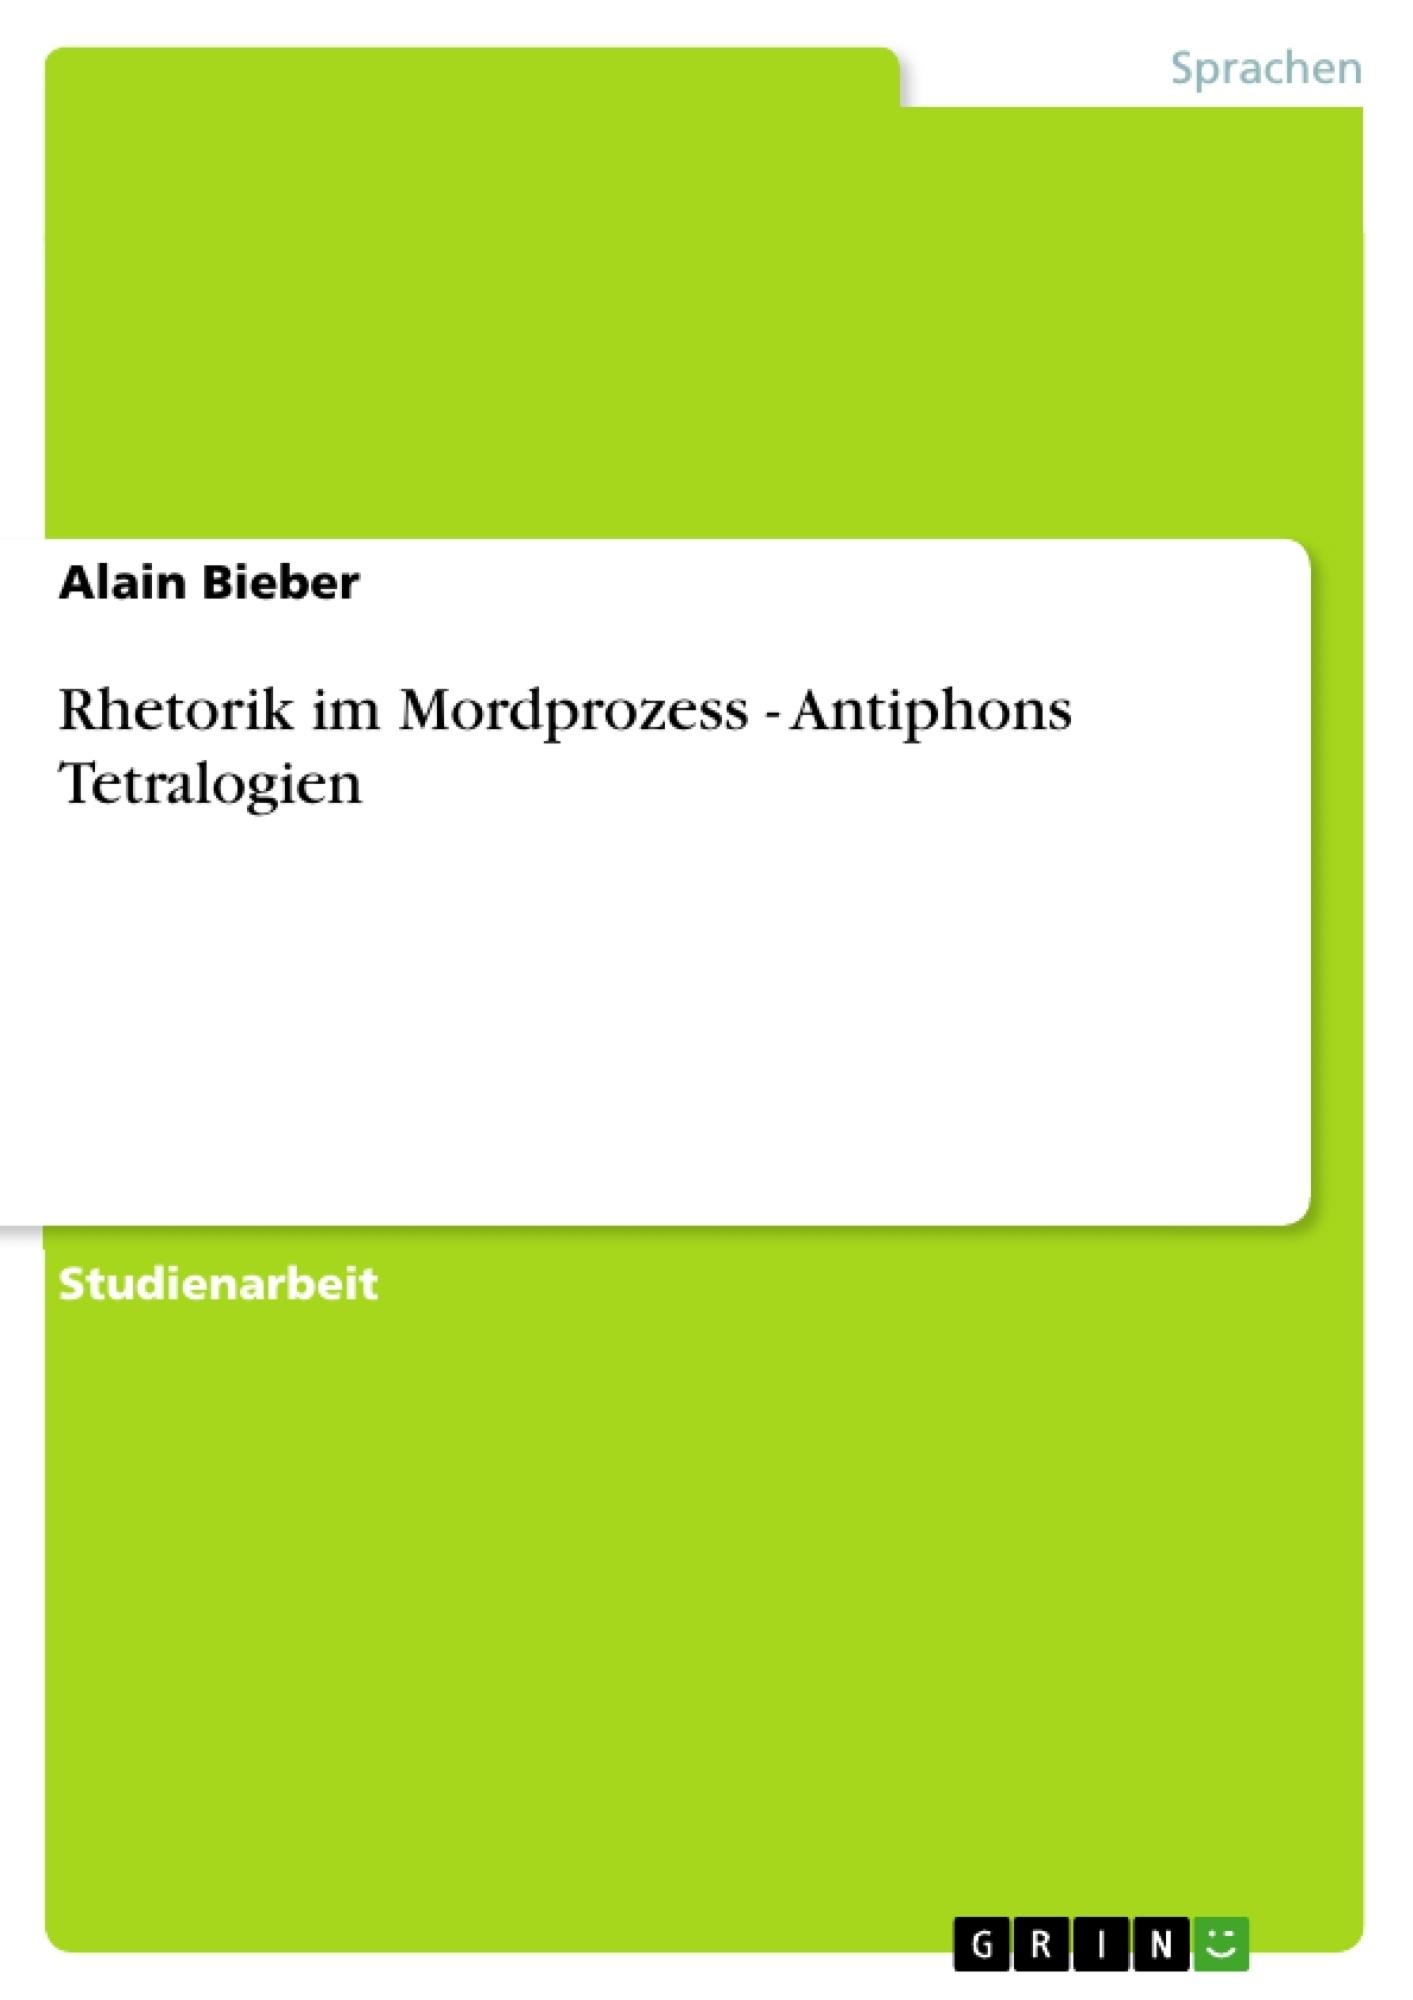 Titel: Rhetorik im Mordprozess - Antiphons Tetralogien